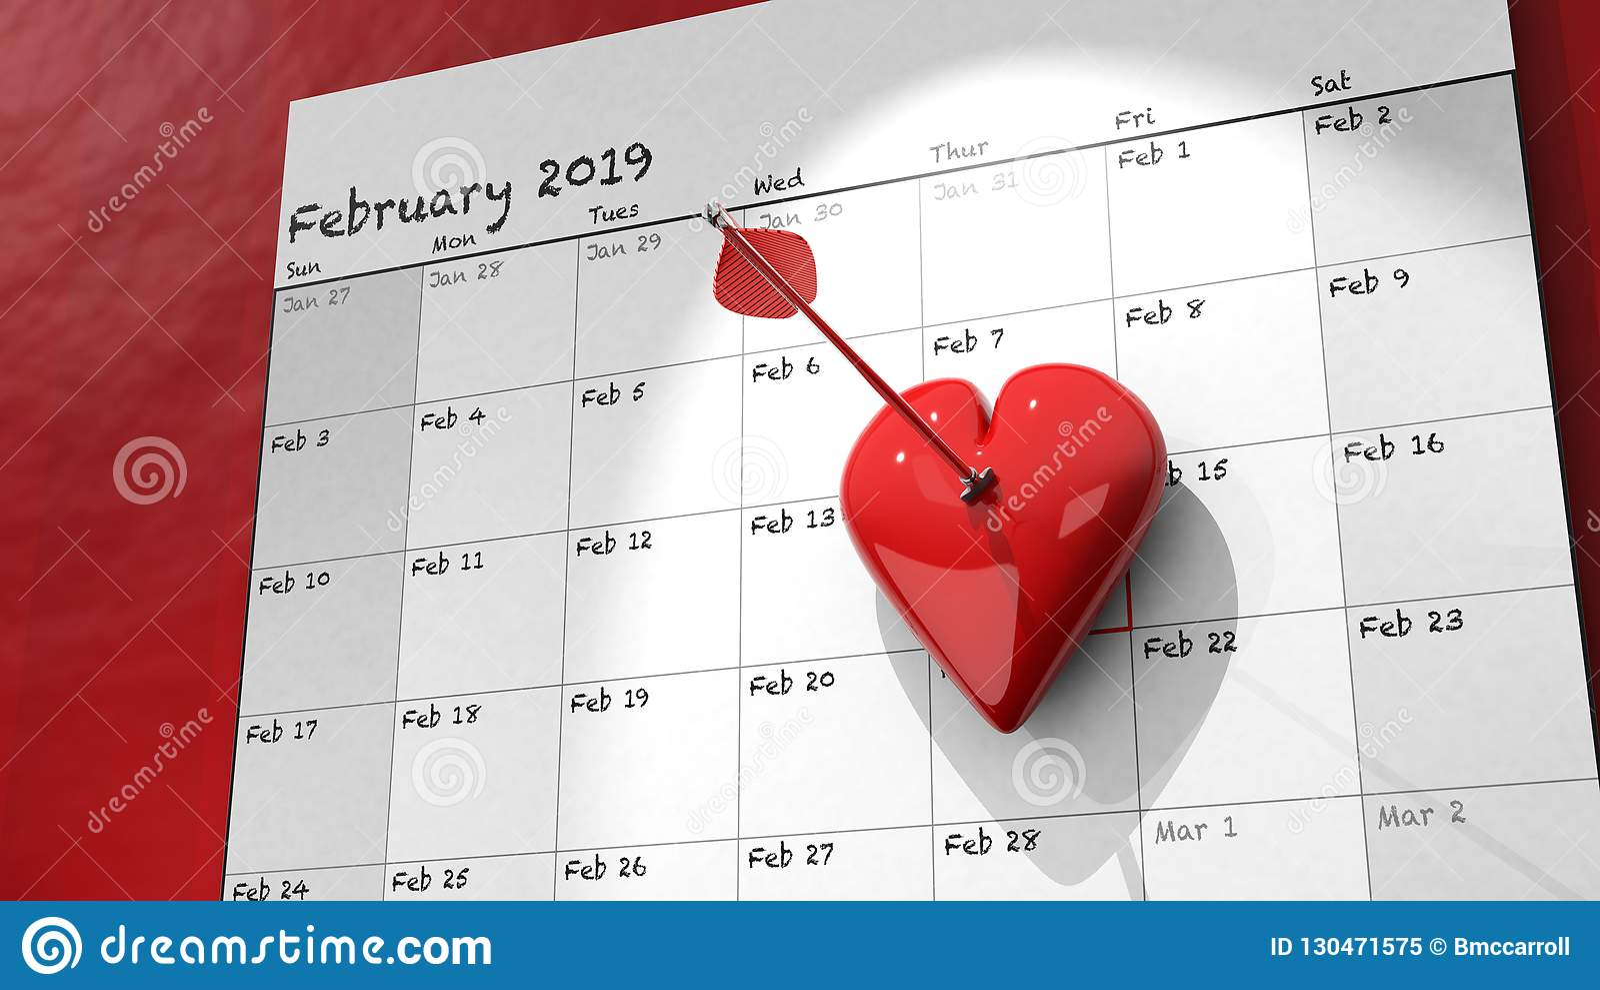 February Calendar 2019 Date 2019 Valentine's Day Calendar Stock Illustration   Illustration of